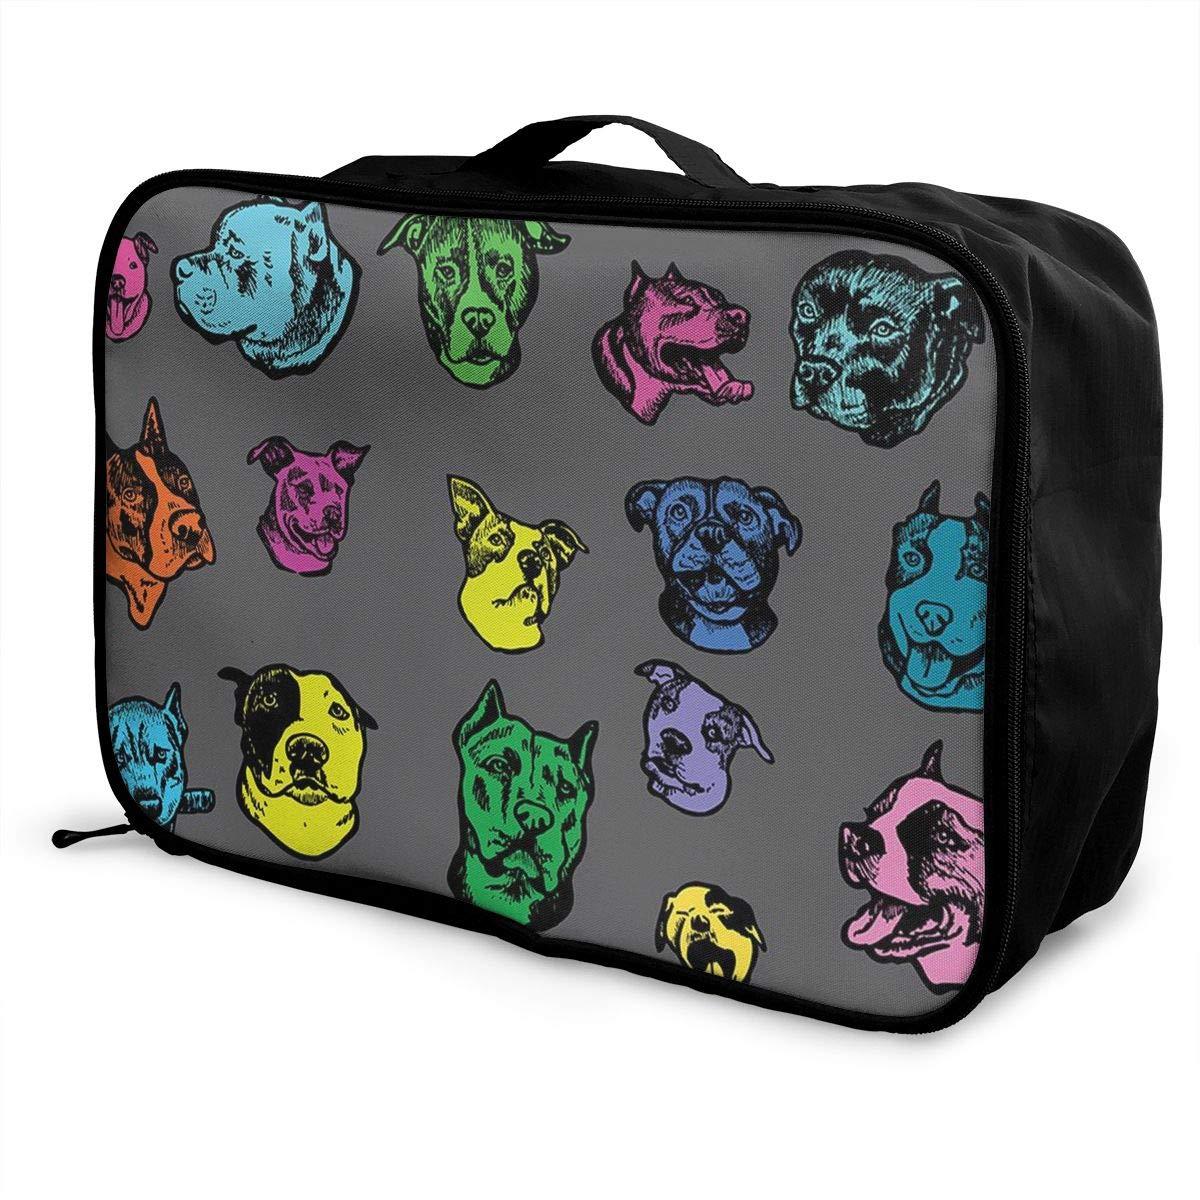 Travel Fashion Lightweight Large Capacity Duffel Portable Waterproof Foldable Storage Carry Luggage Tote Bag Pitbull Dog Art